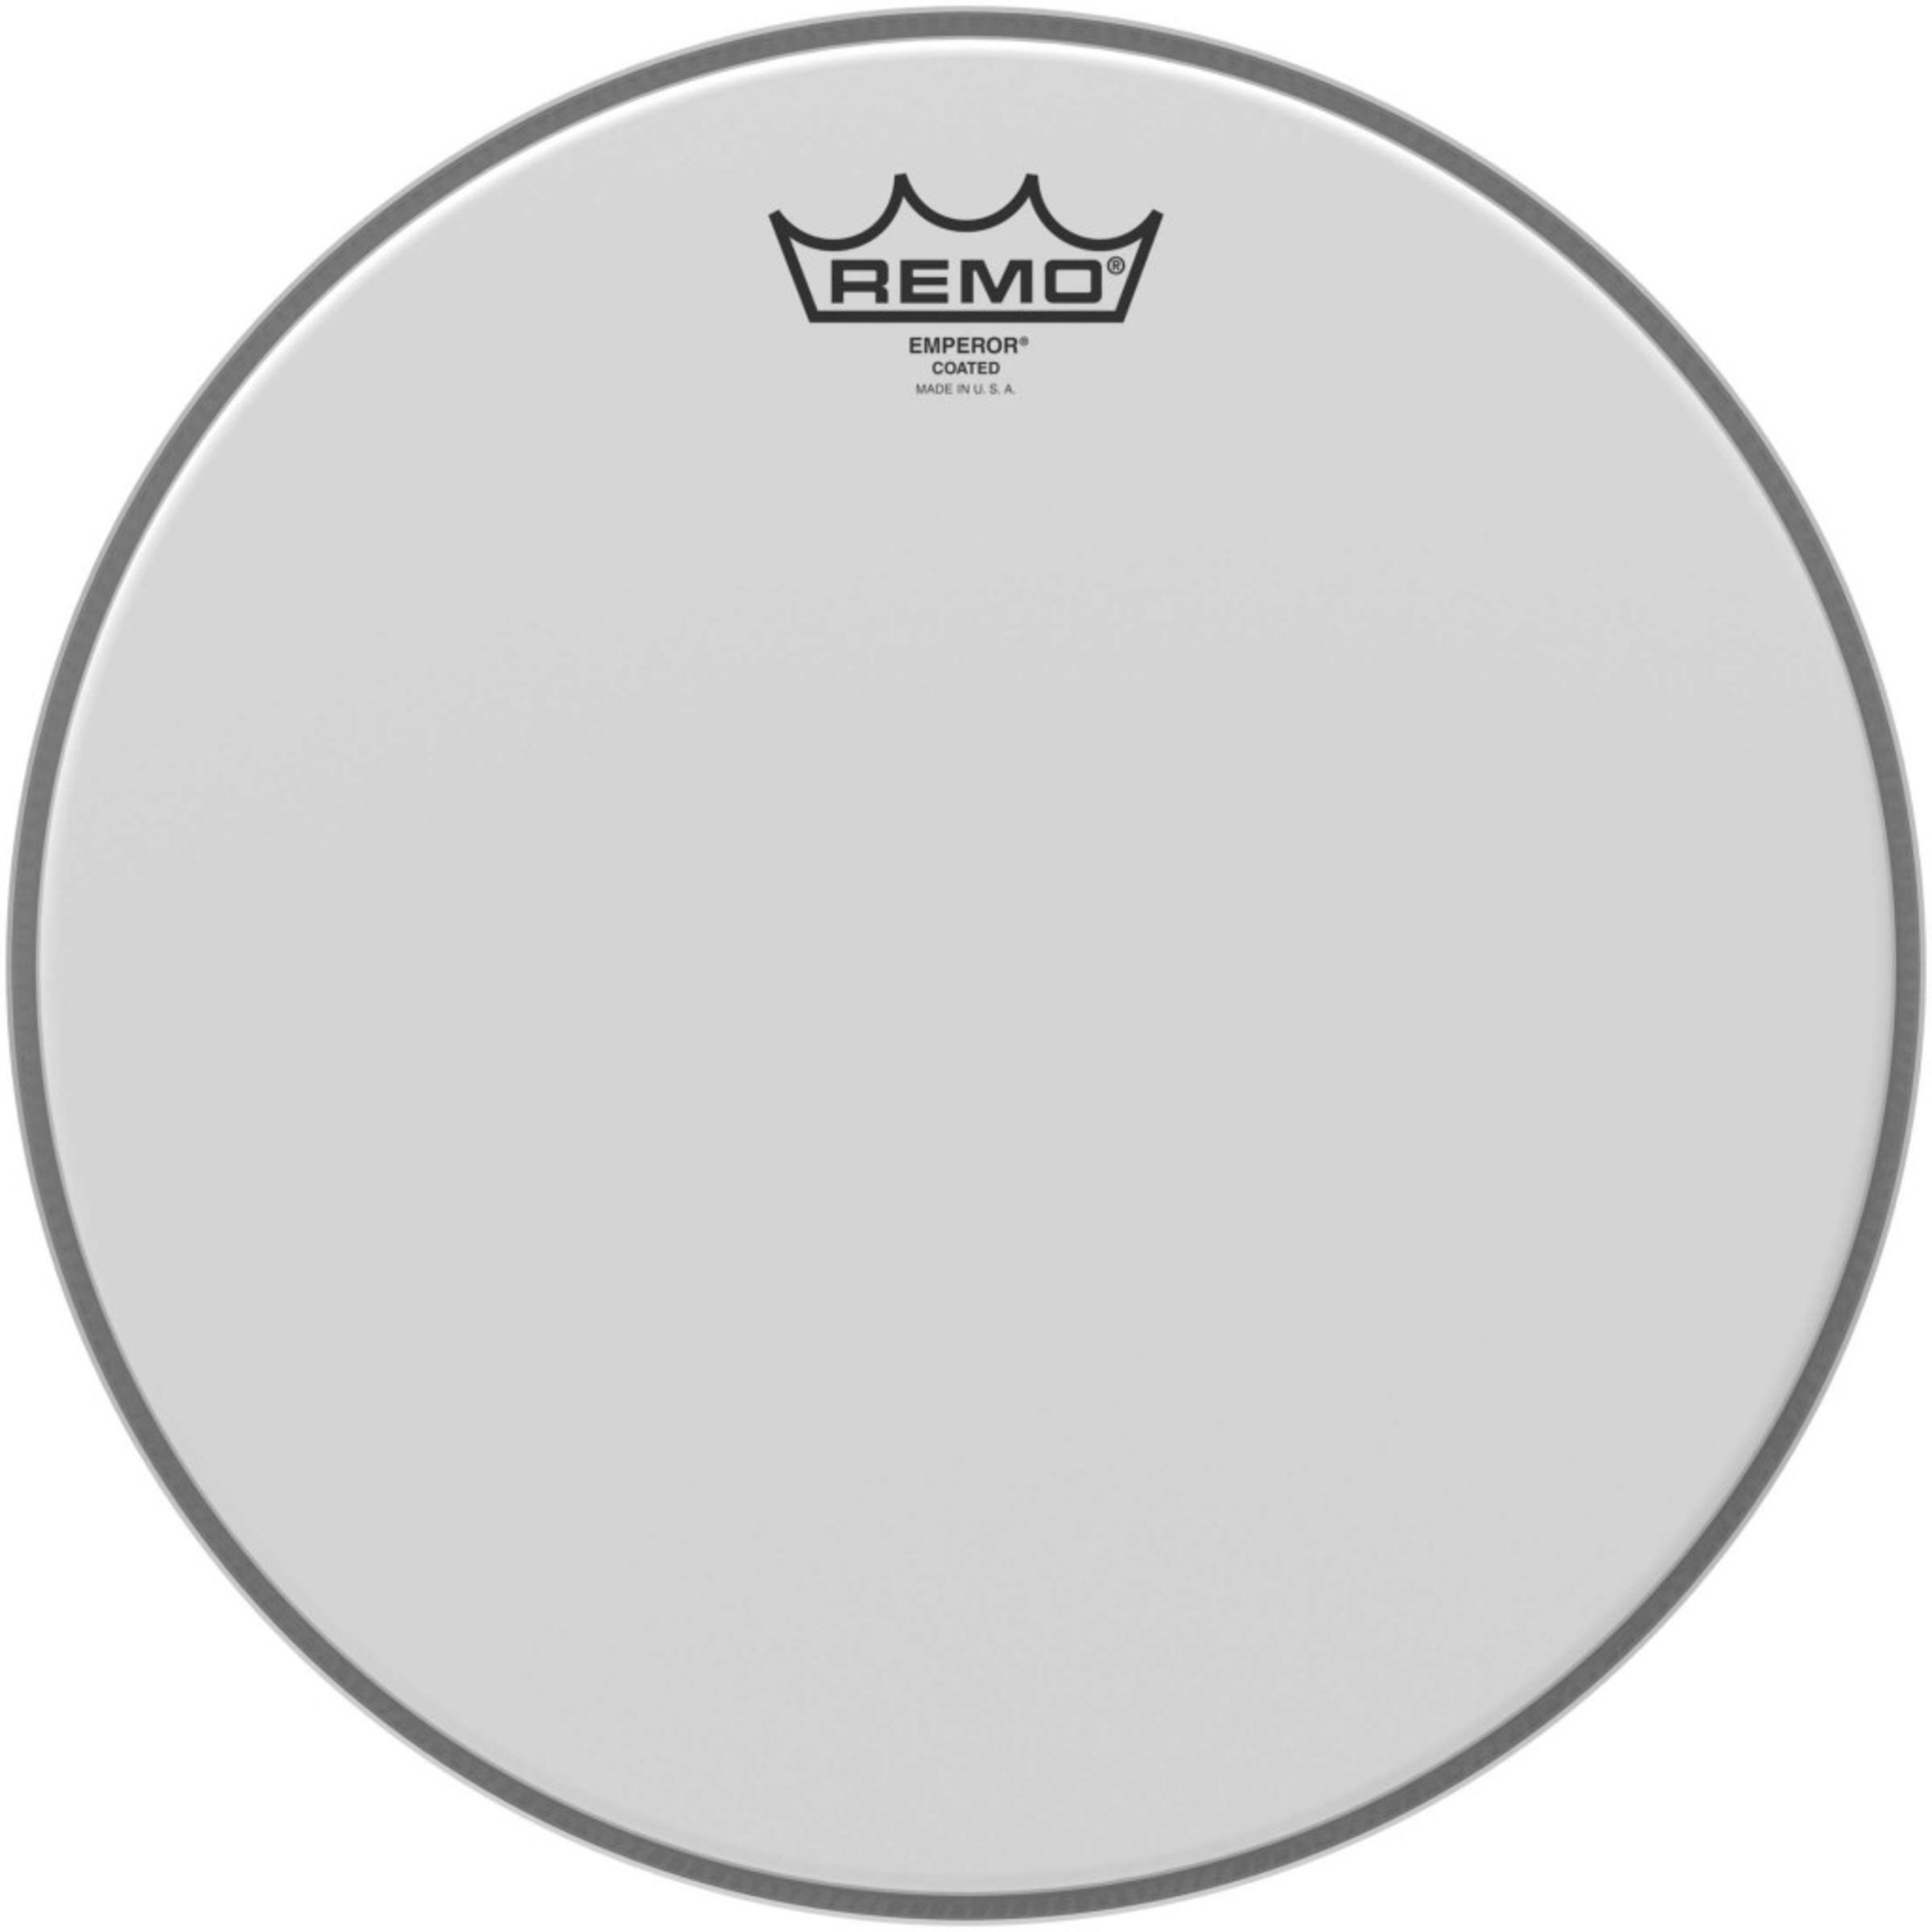 remo emperor coated bass drum head giggear. Black Bedroom Furniture Sets. Home Design Ideas